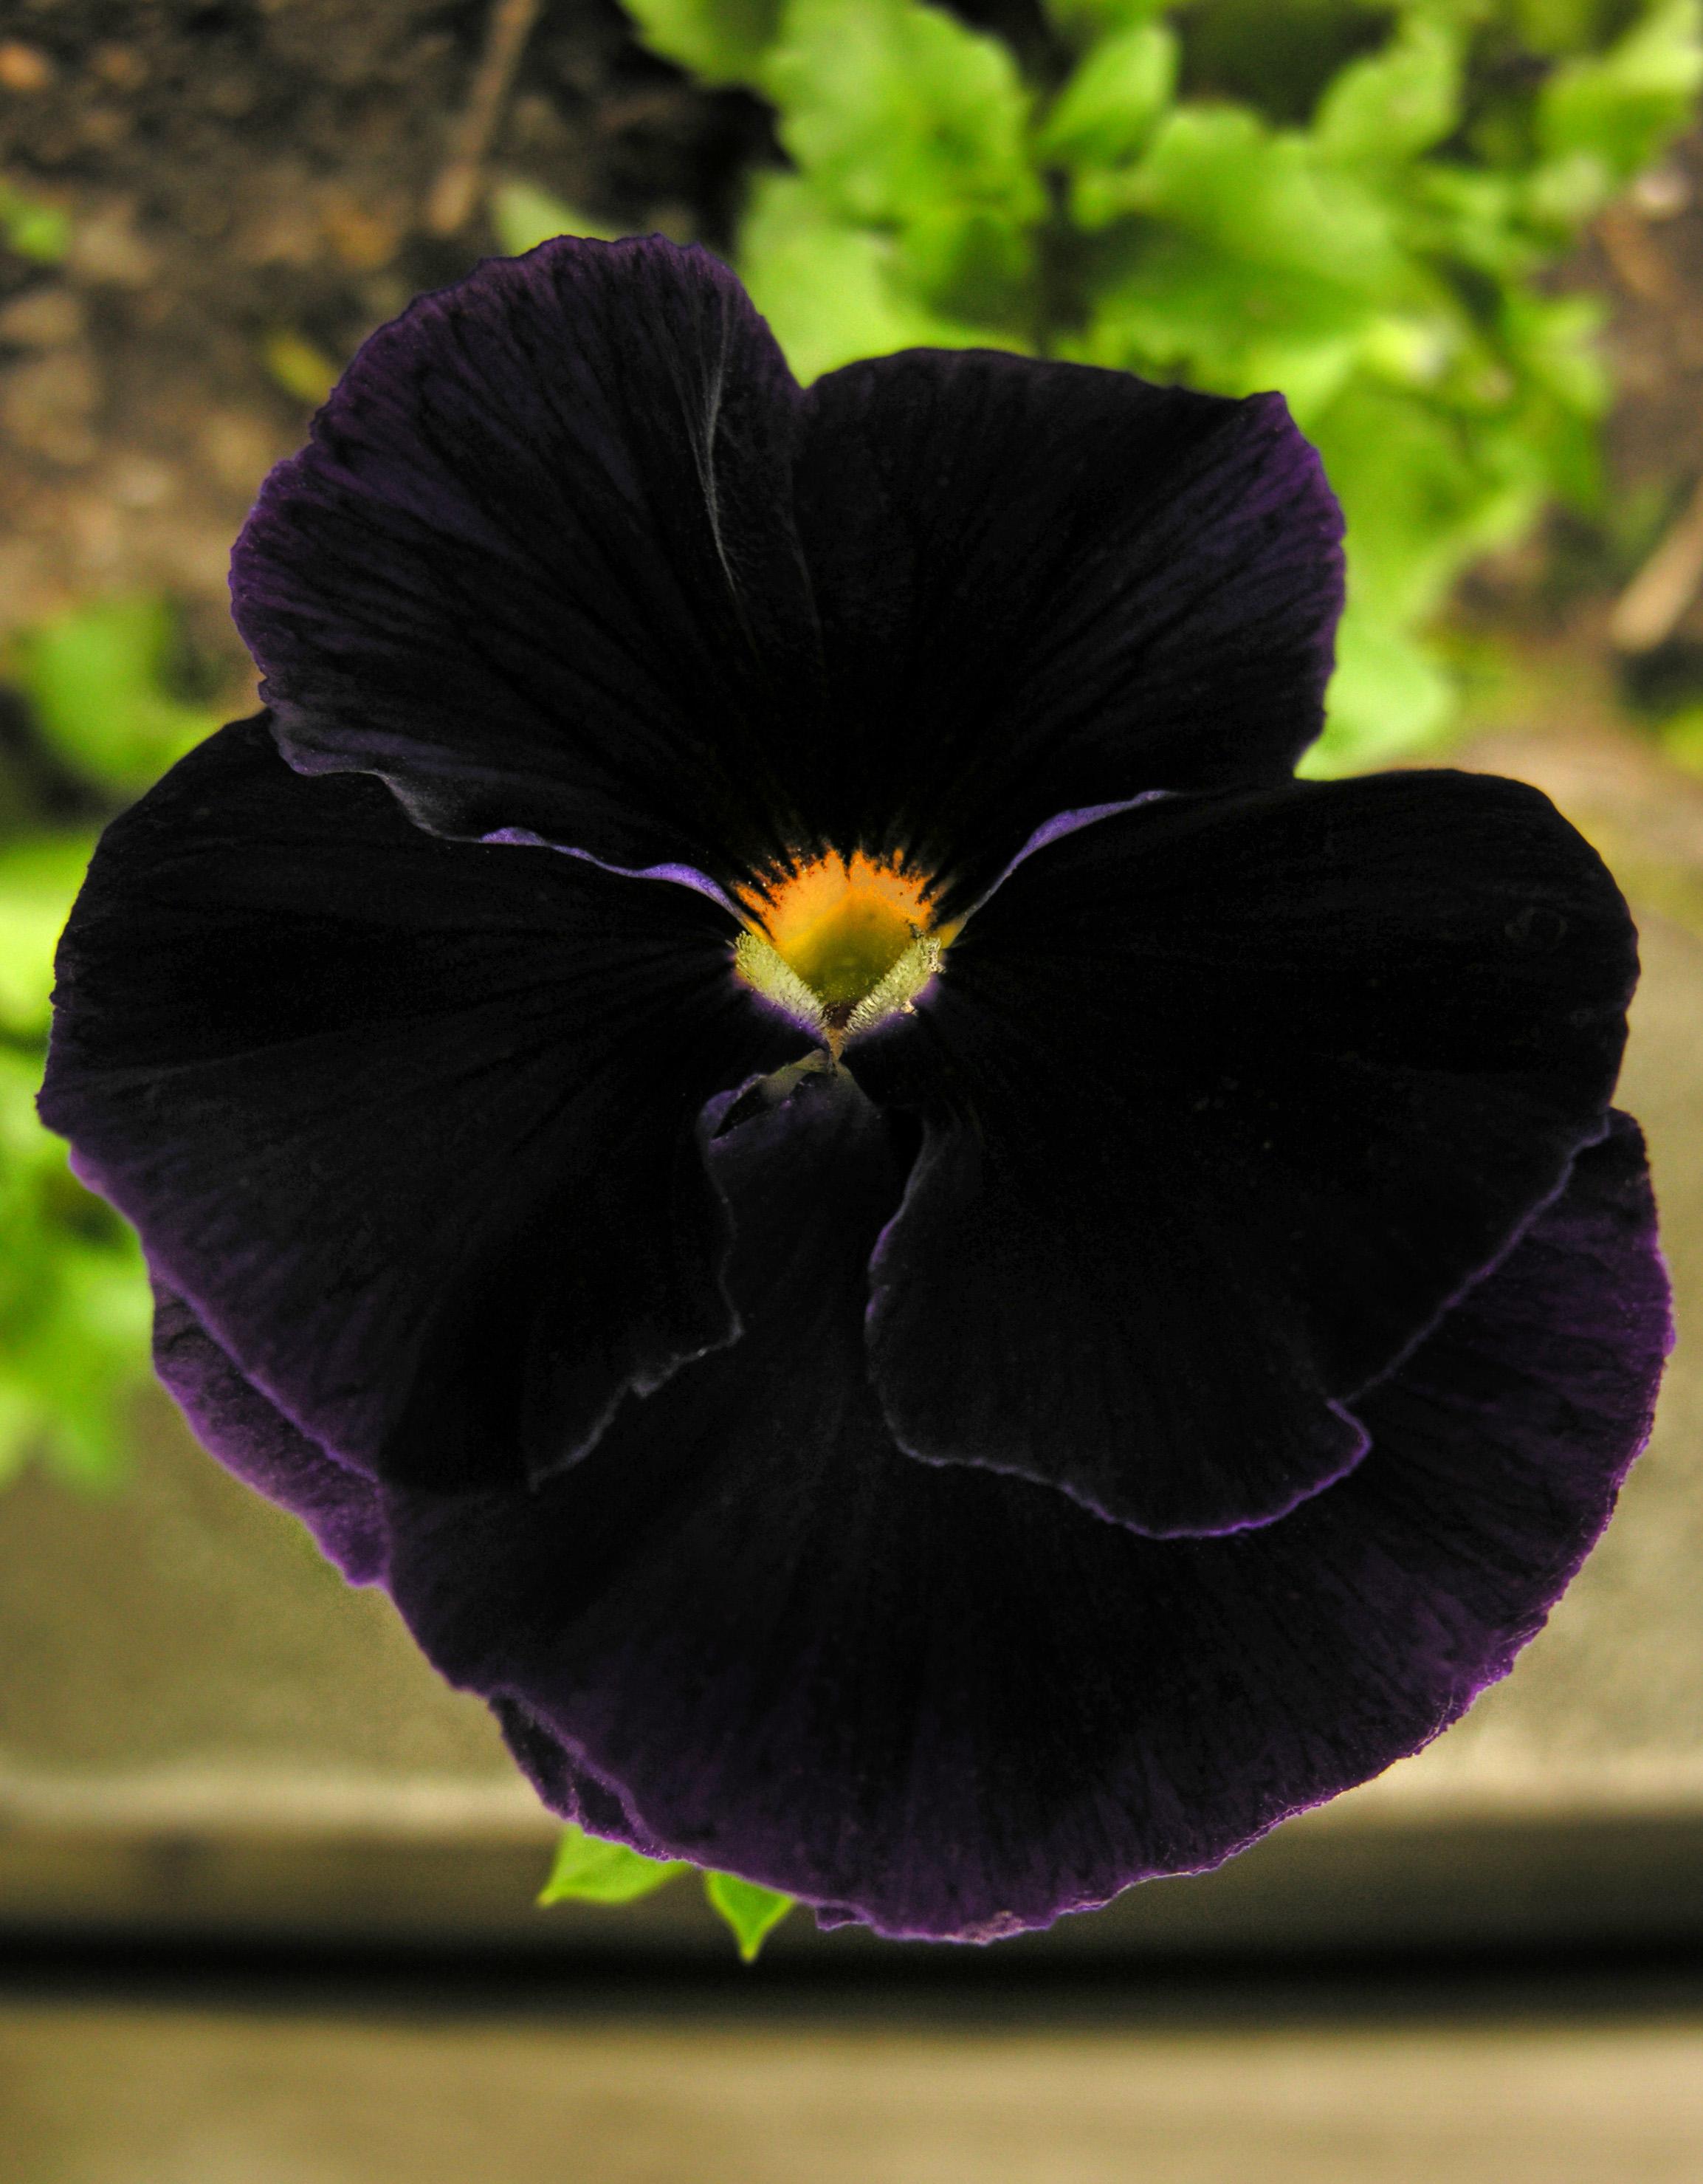 Black pansy